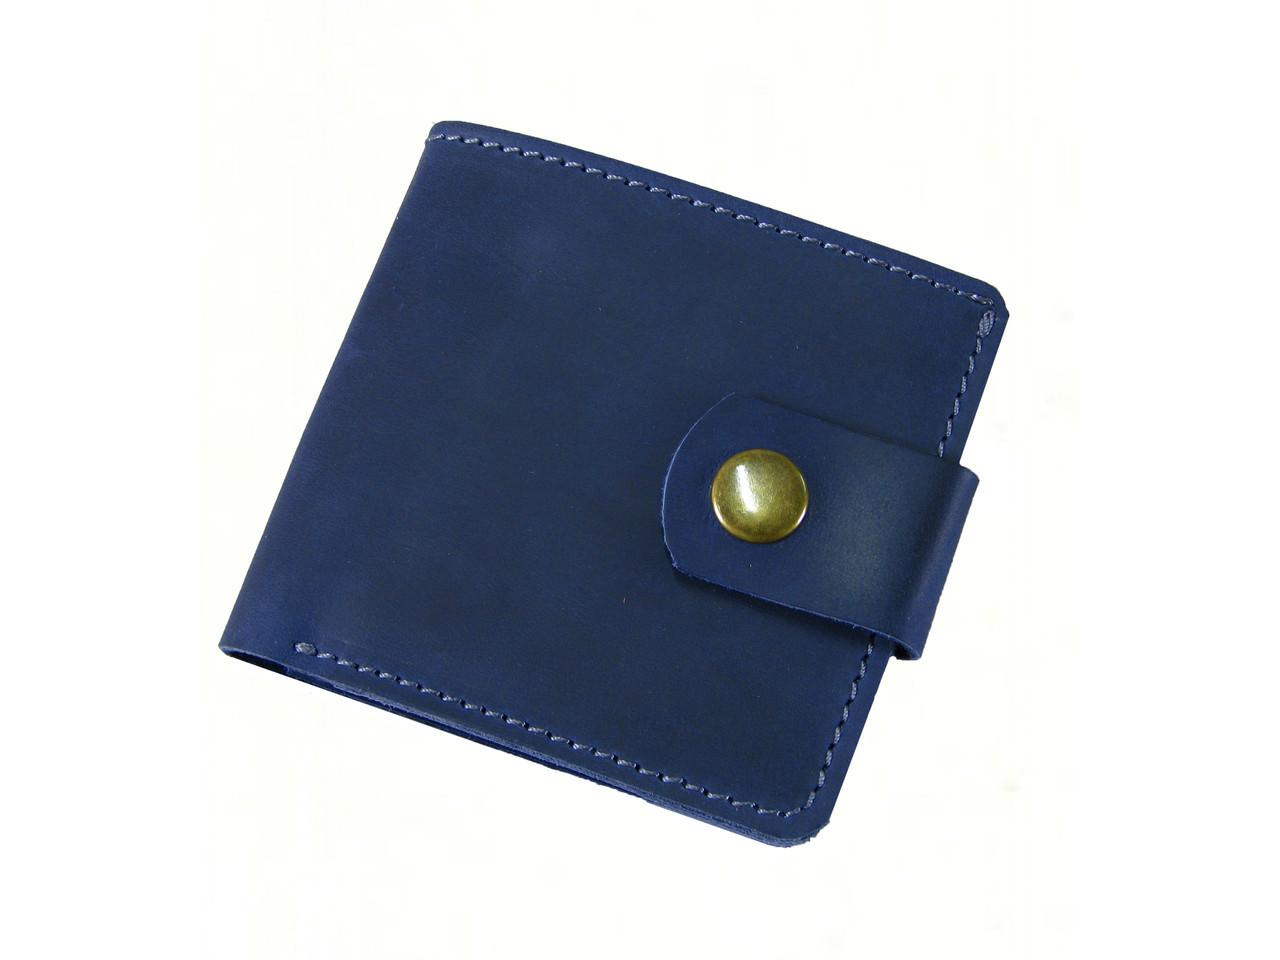 Женский кошелек бумажник GS кожаный синий